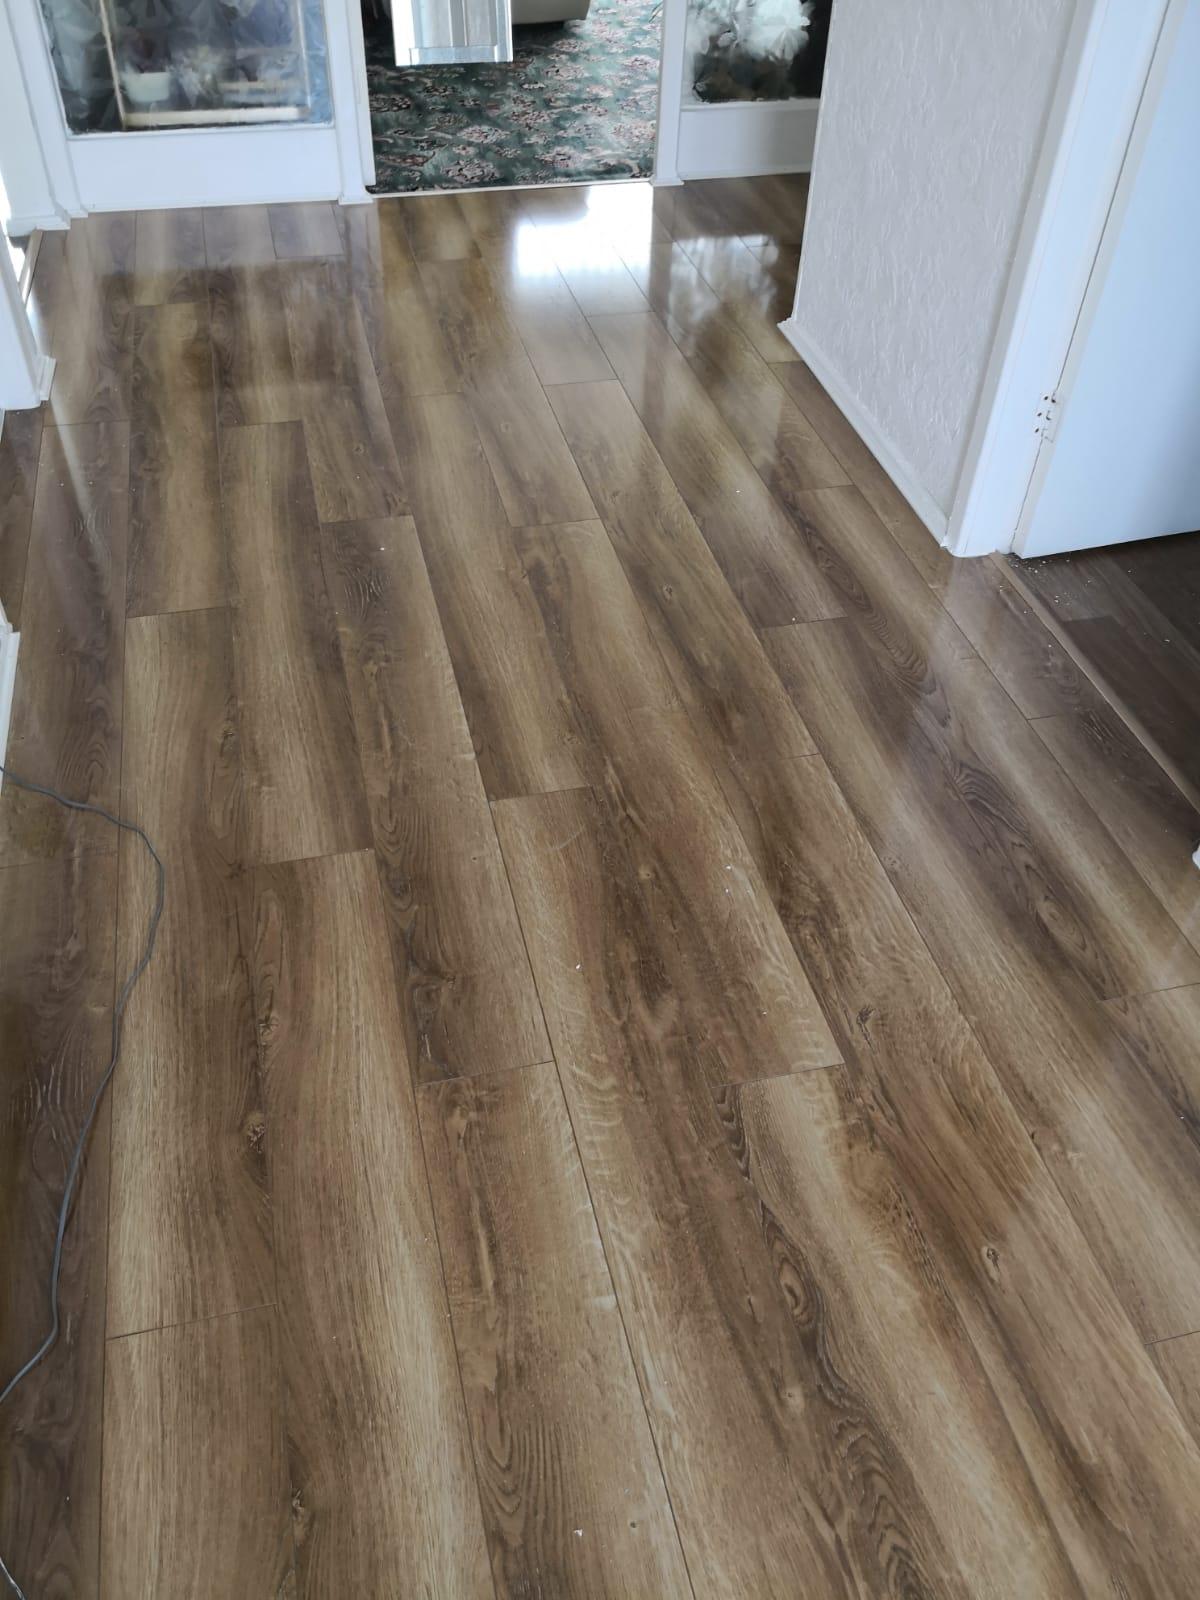 Canadia Prestige Rustic Oak Gloss Laminate Flooring The